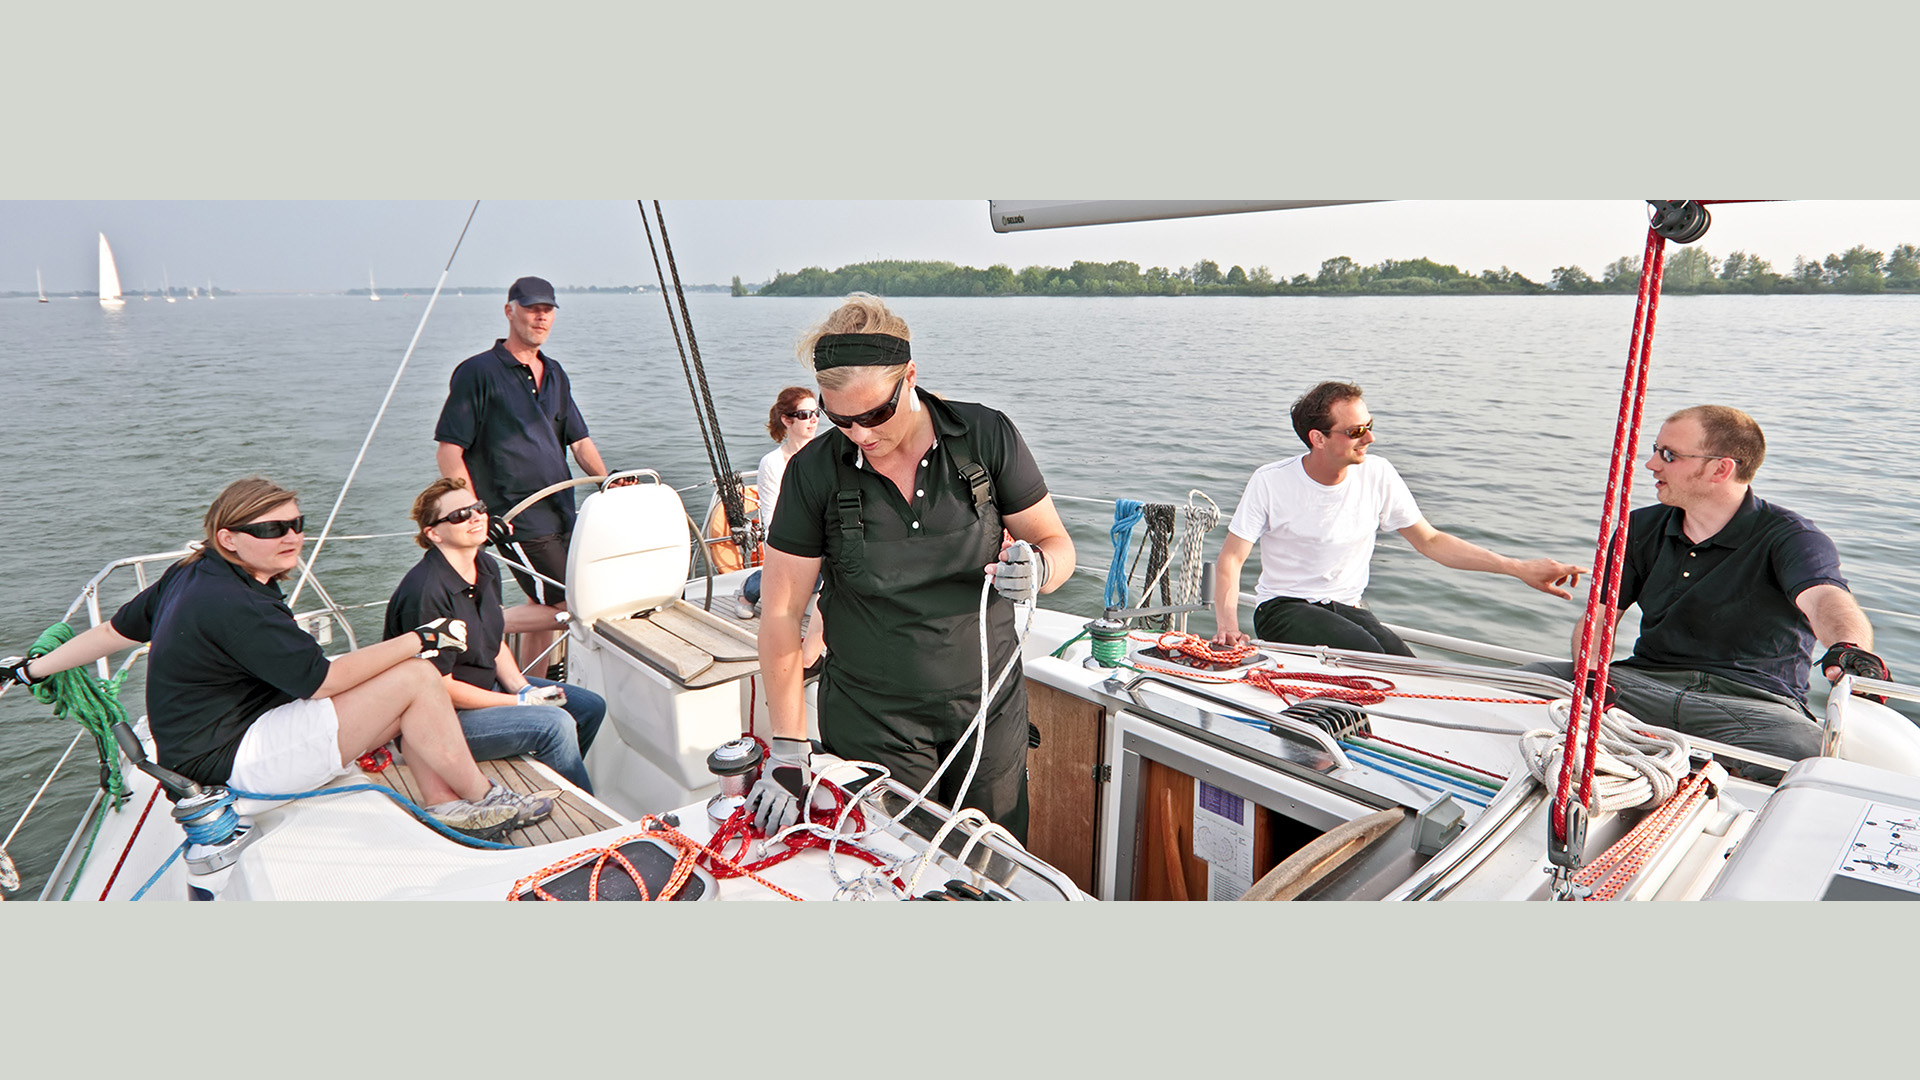 2-banery_ykp_Szkolenia żeglarskie